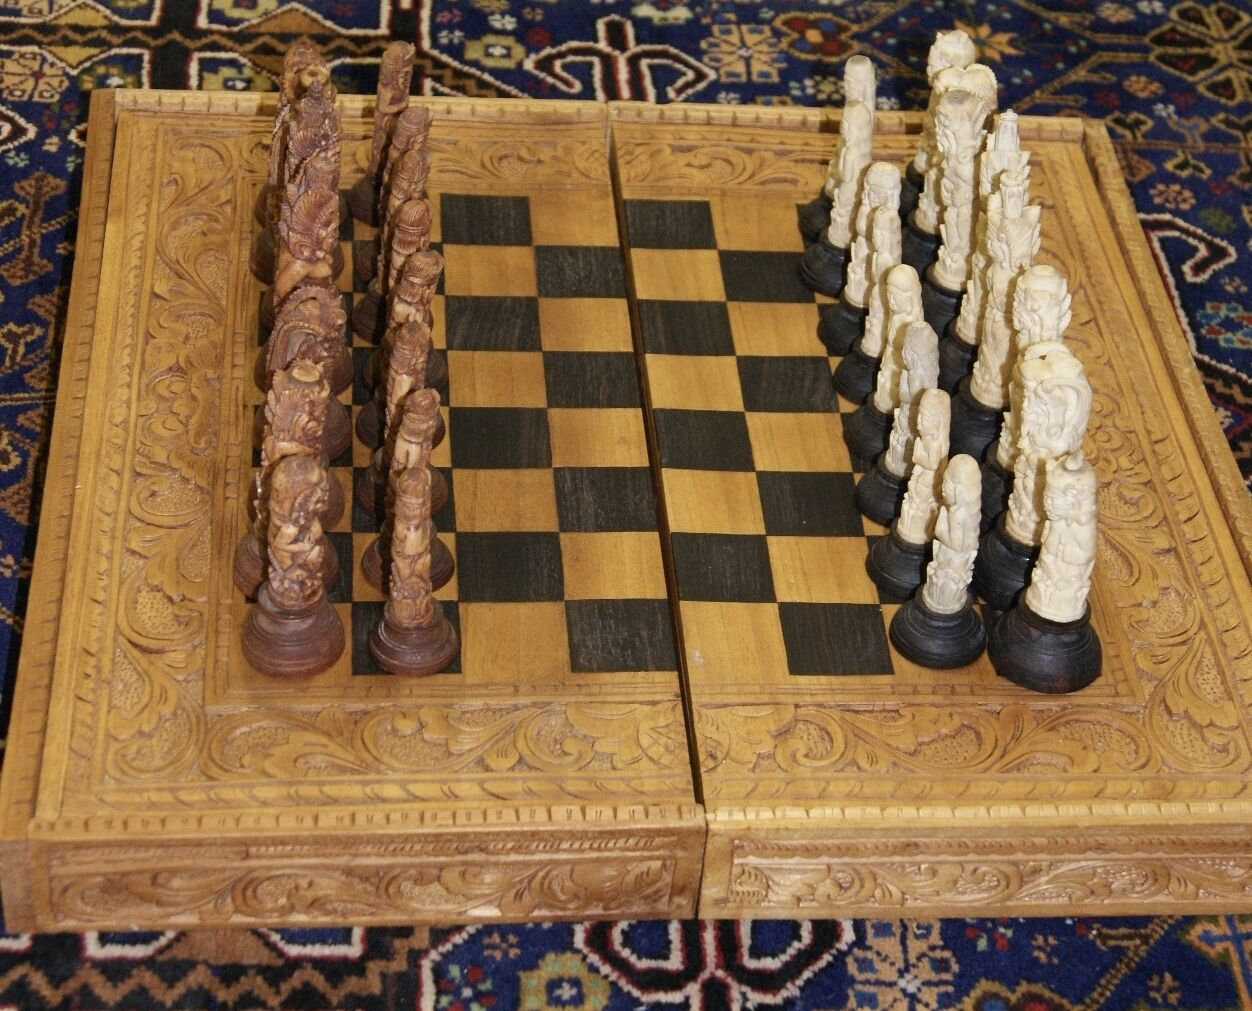 Rare Balinese Deer Antler He autoved Chess  Set  articoli promozionali